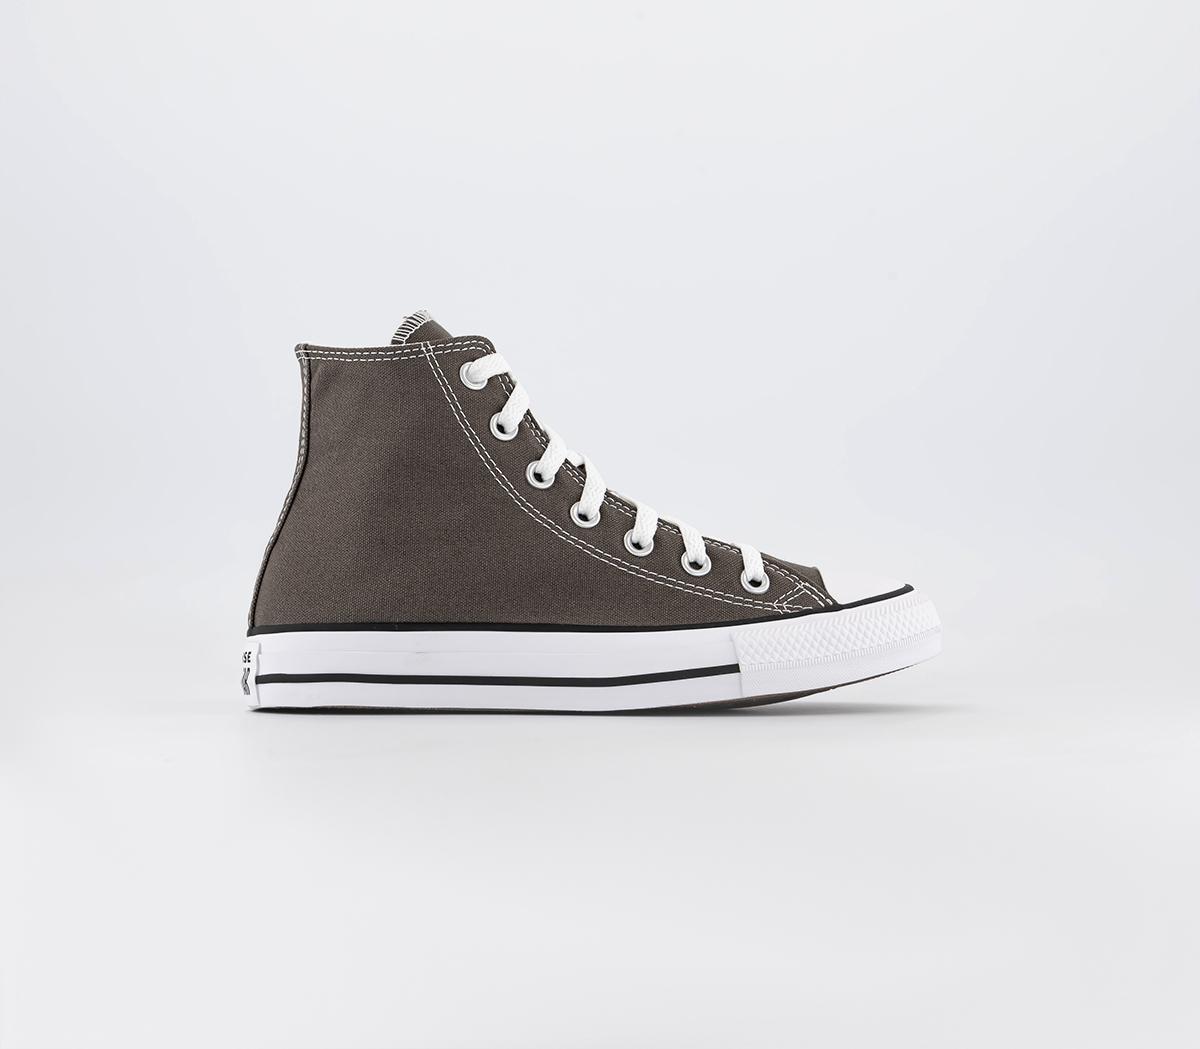 Converse All Star Hi Charcoal - Unisex